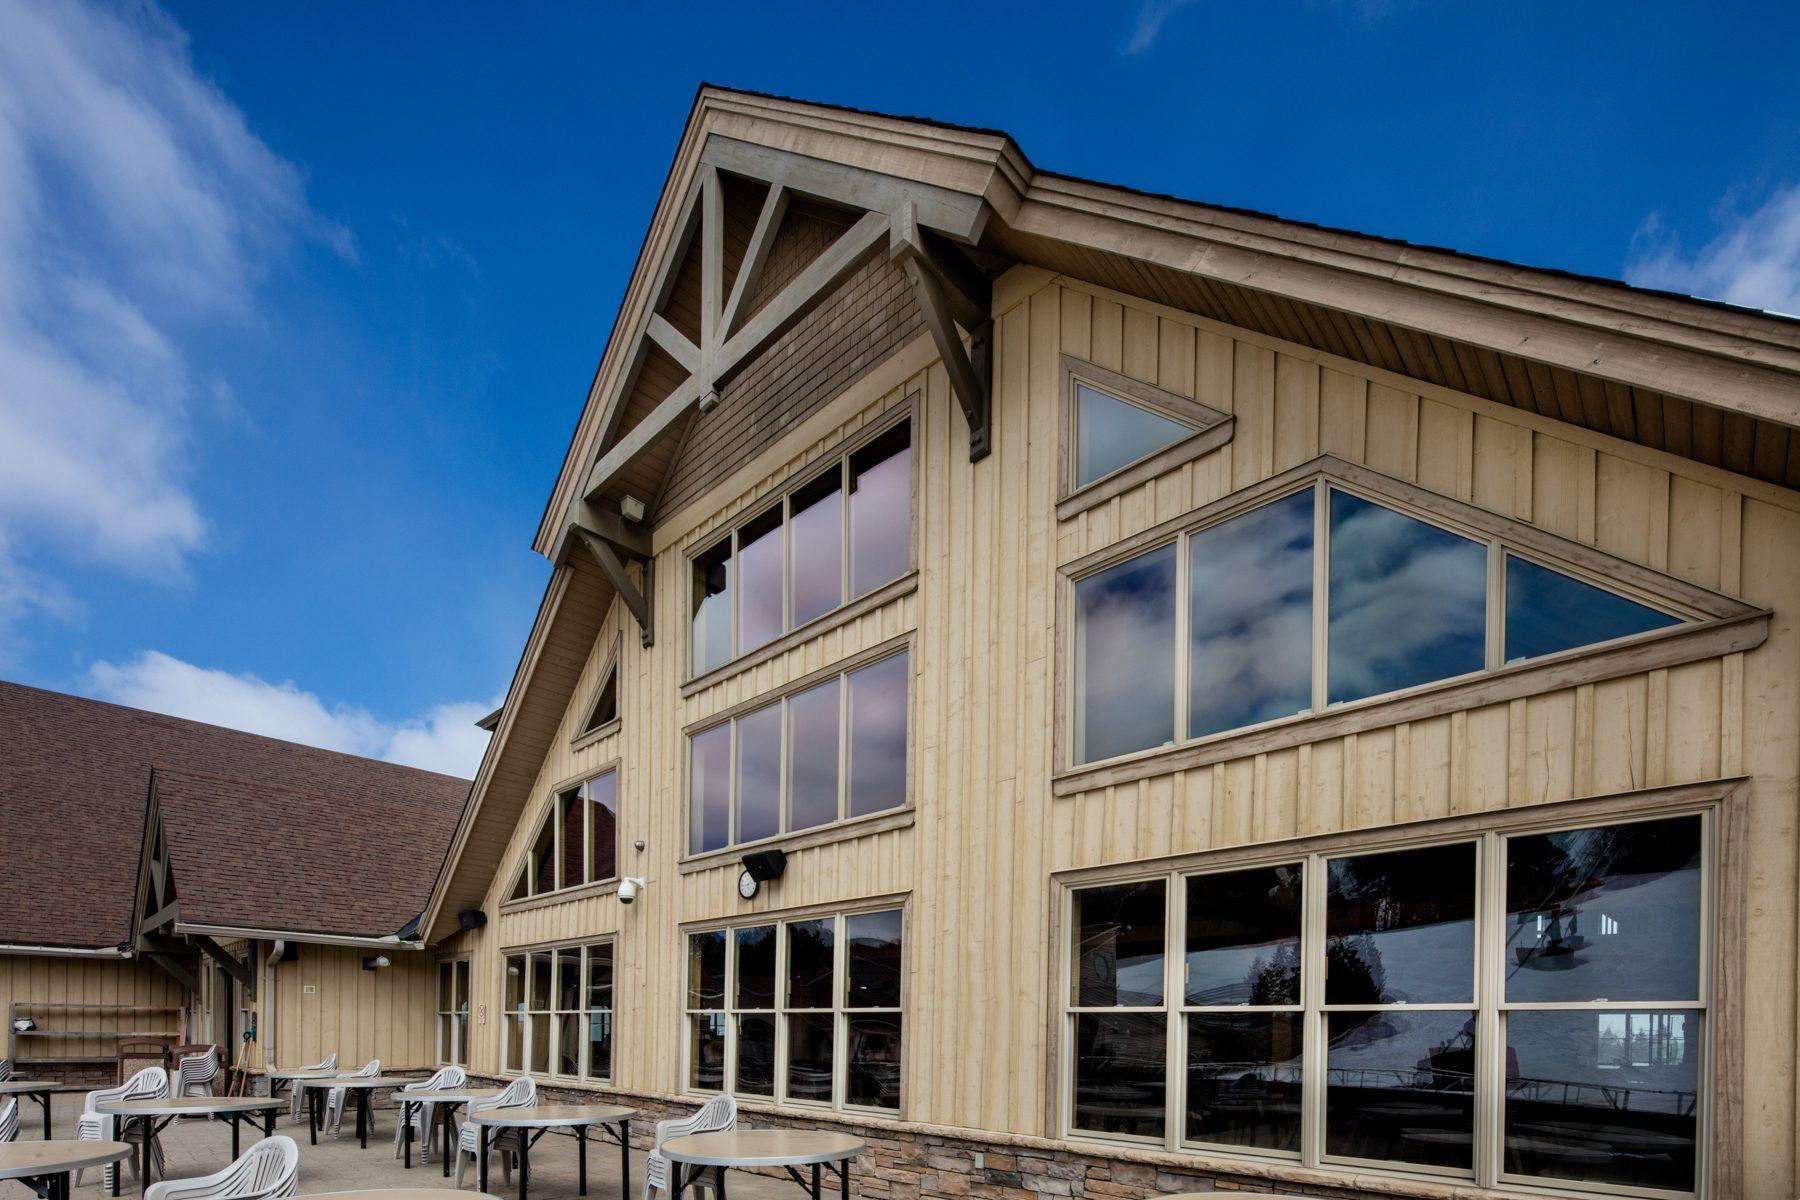 Normerica Timber Frame, Commercial Project, Craigleith Ski Club, Ski Resort, Collingwood, Ontario, Exterior